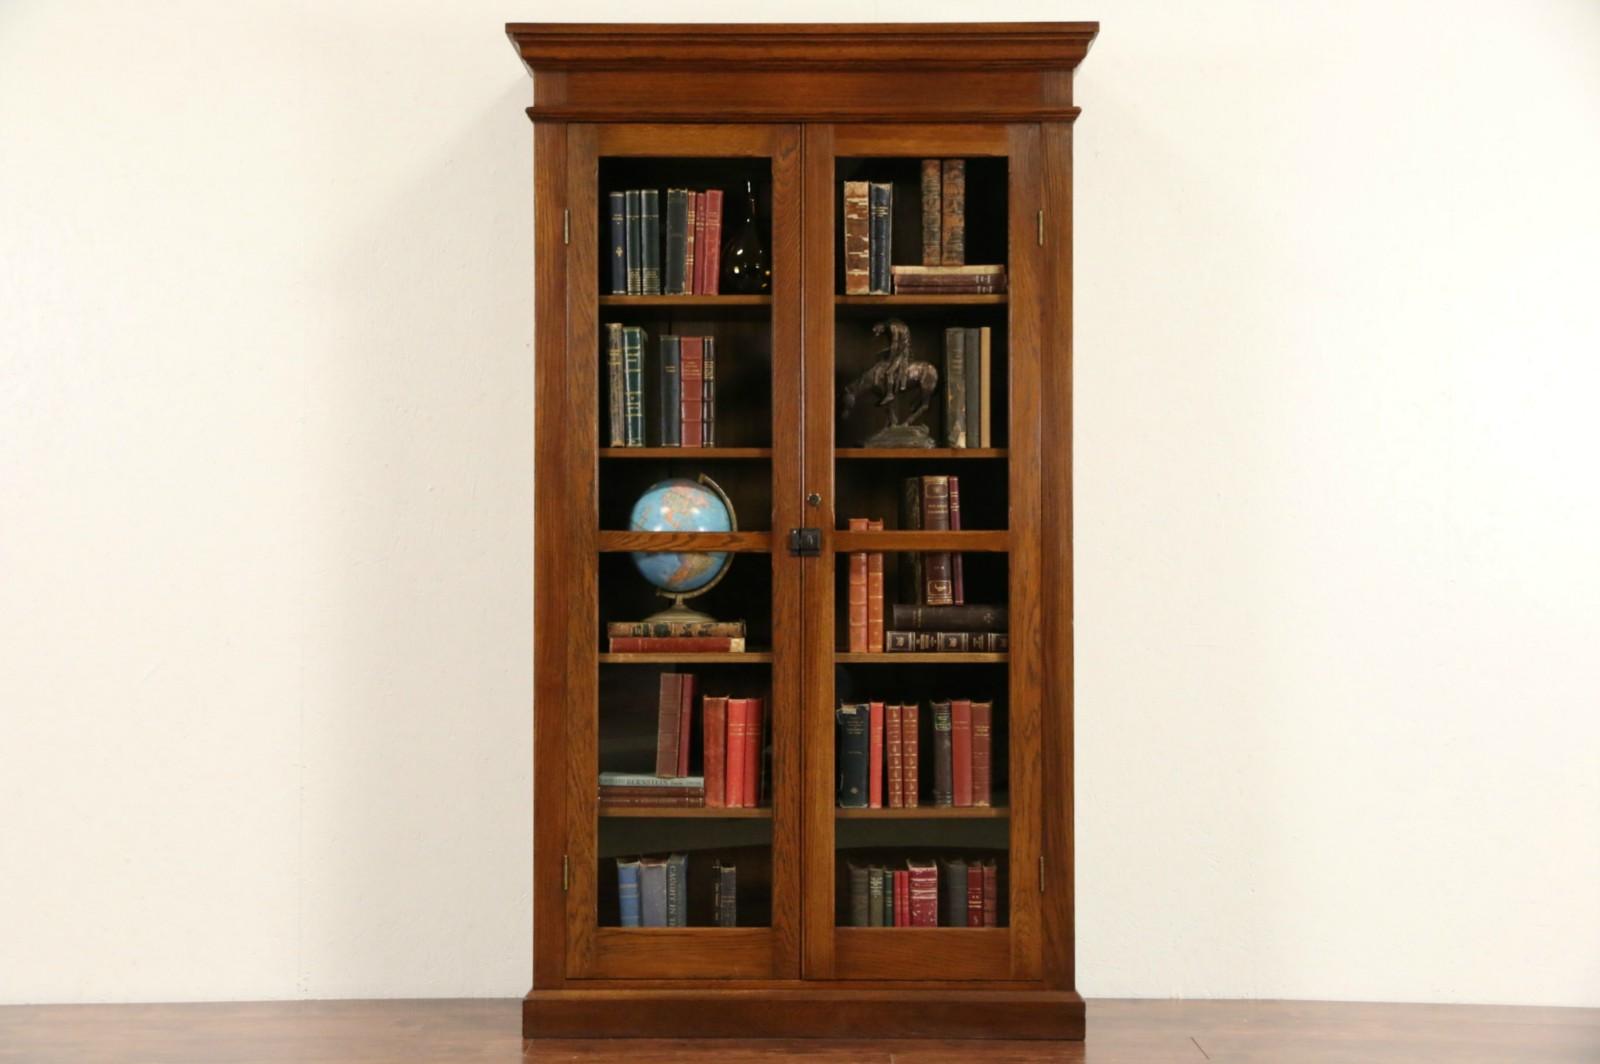 Oak 1900 antique tall bookcase display cabinet glass doors adjustable shelves